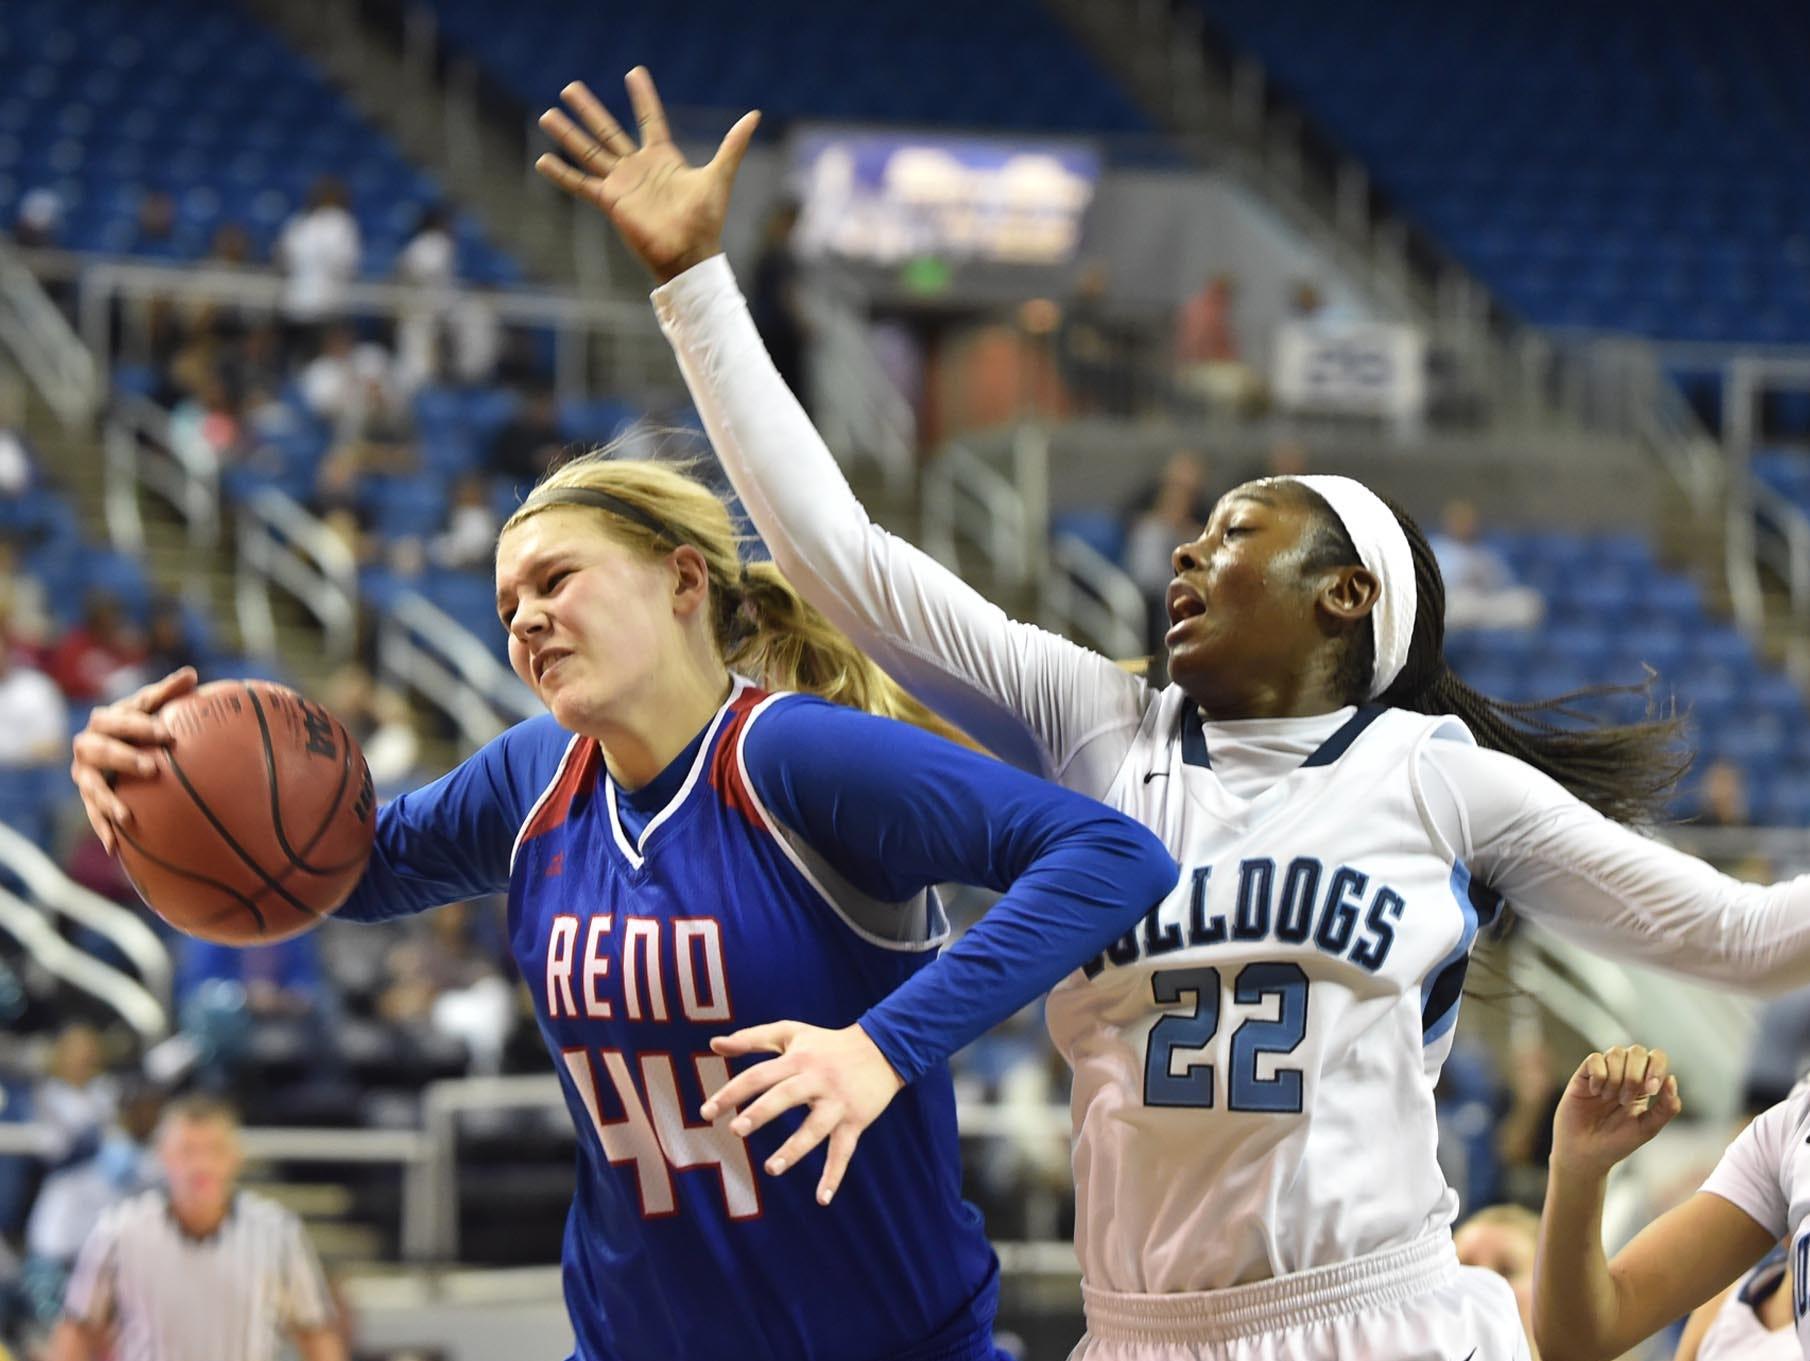 Reno senior Mallory McGwire grabs a rebound against Centennial's Eboni Walker on Friday.